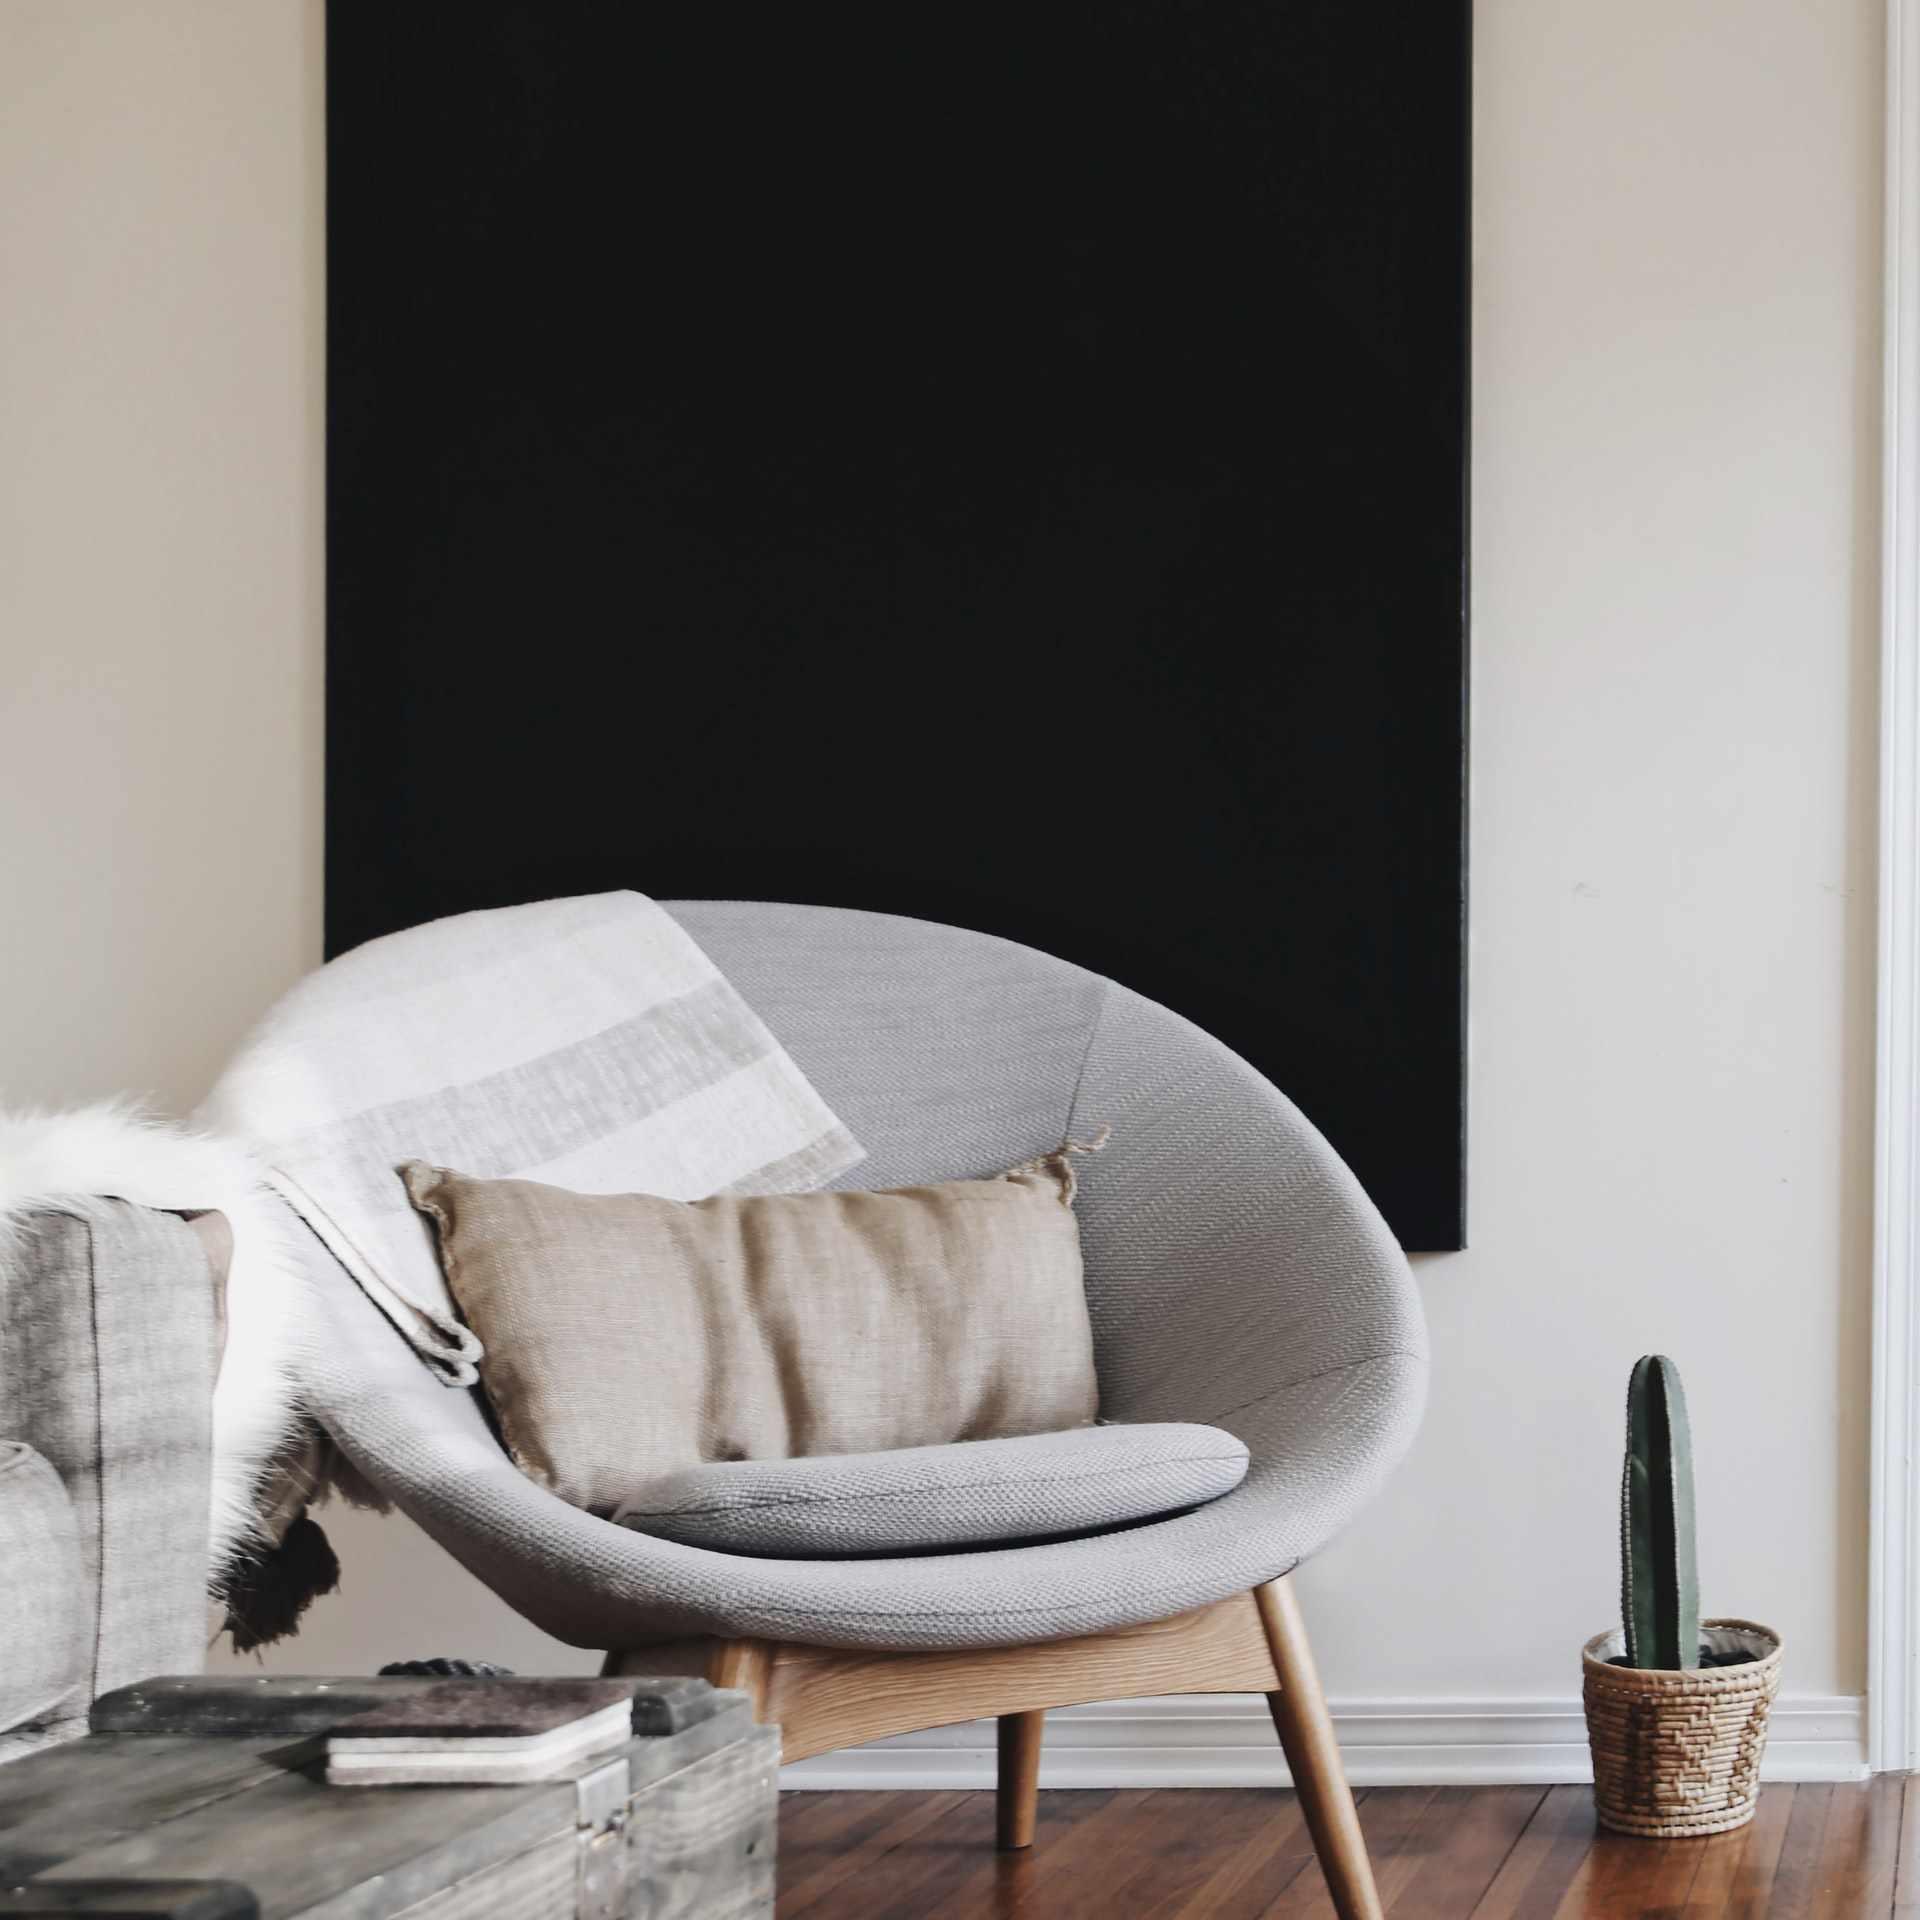 round chair in minimalist room